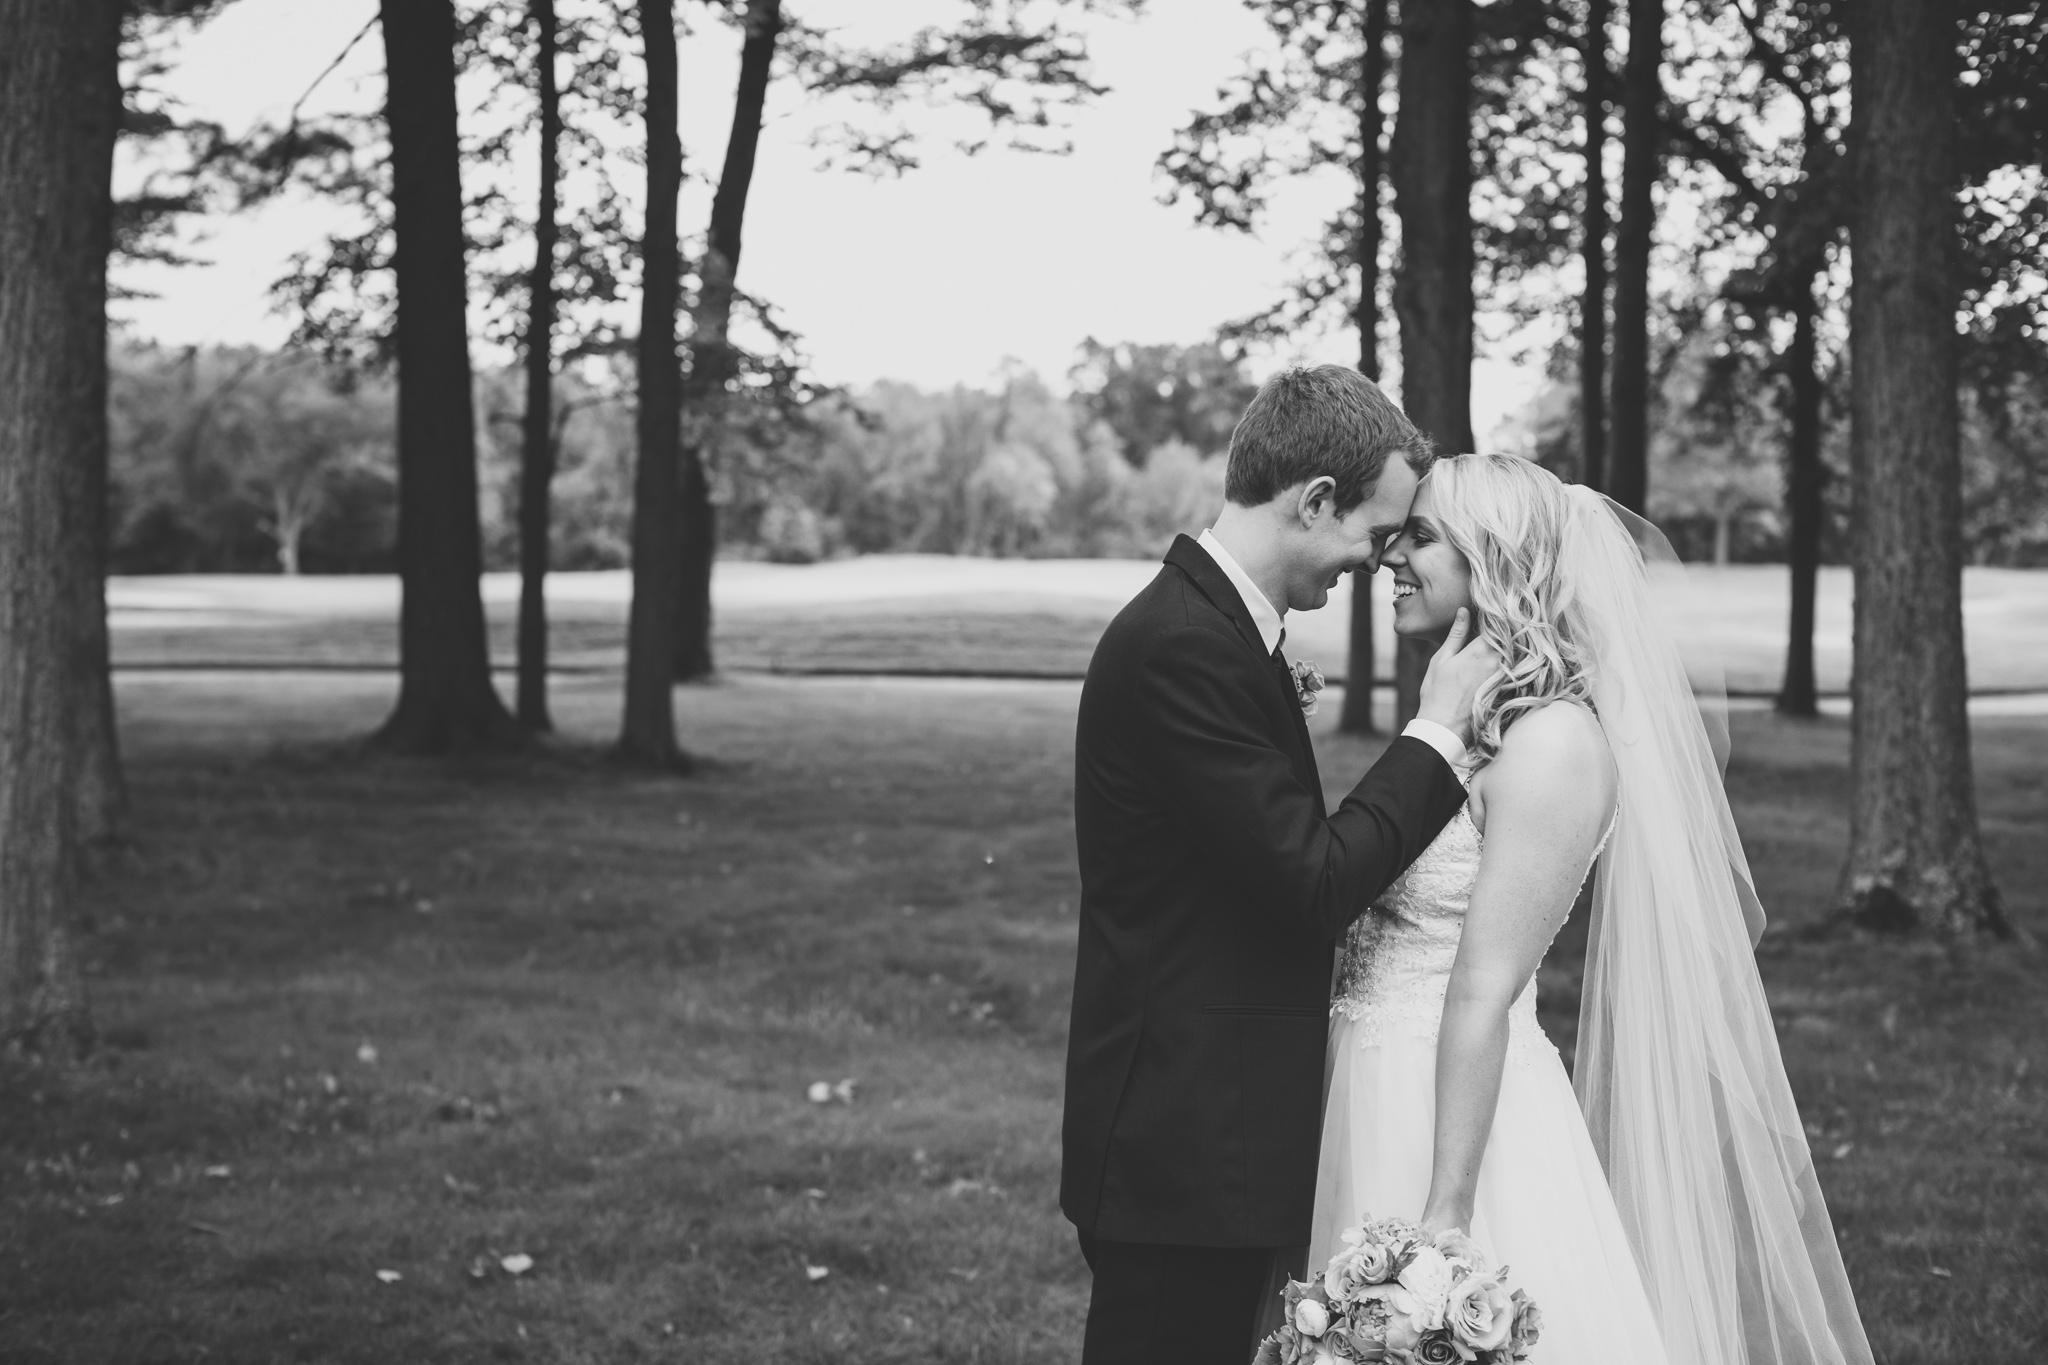 121-best-detroit-michigan-outdoor-wedding-photographer.jpg